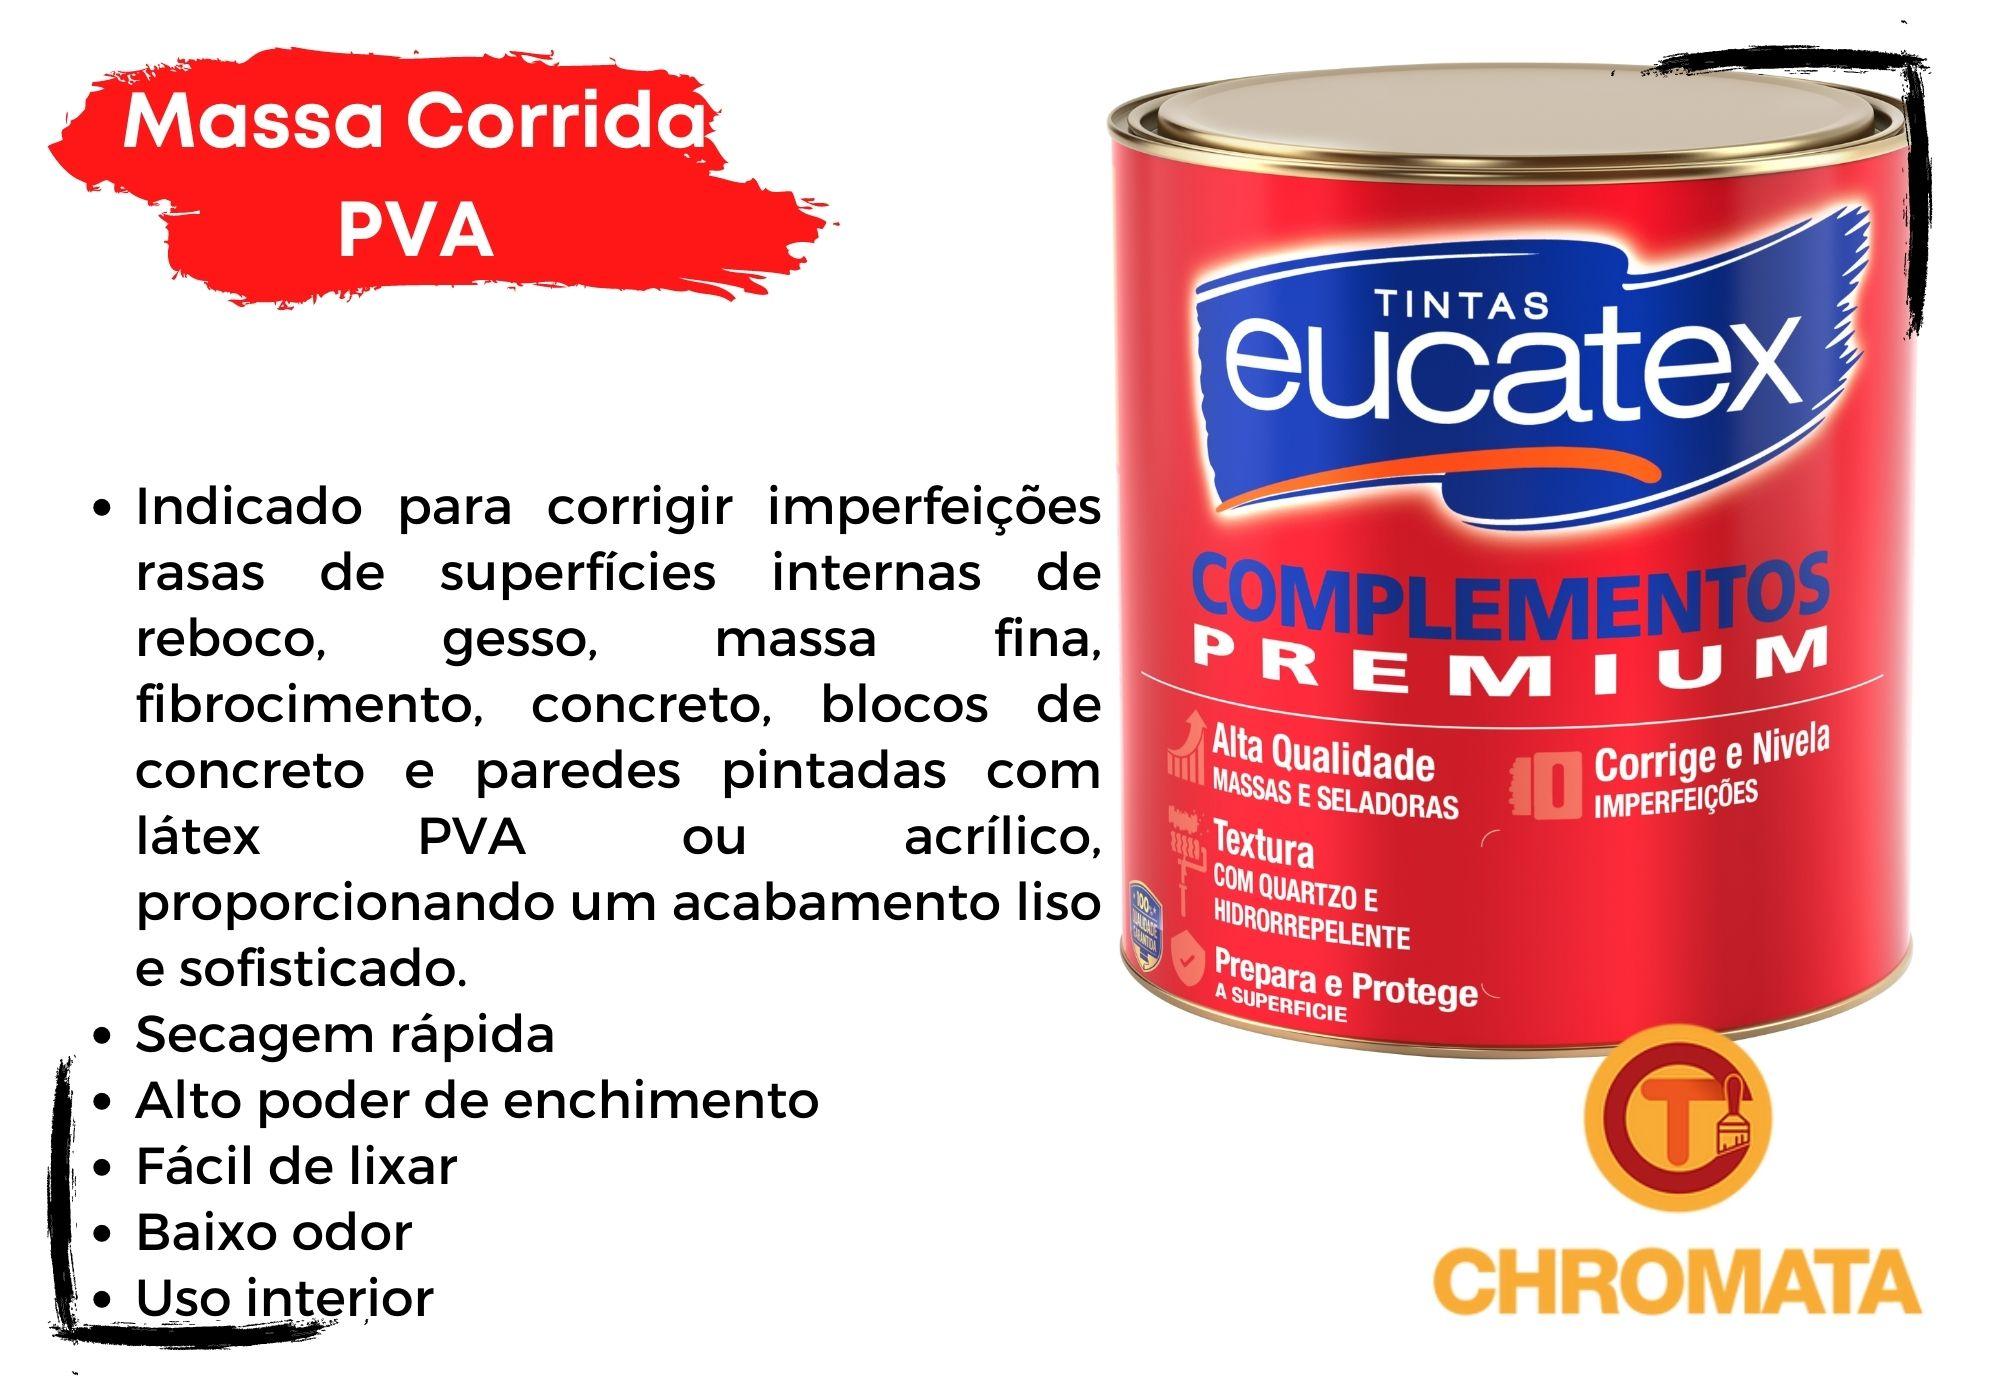 Eucatex Massa Corrida PVA Interior